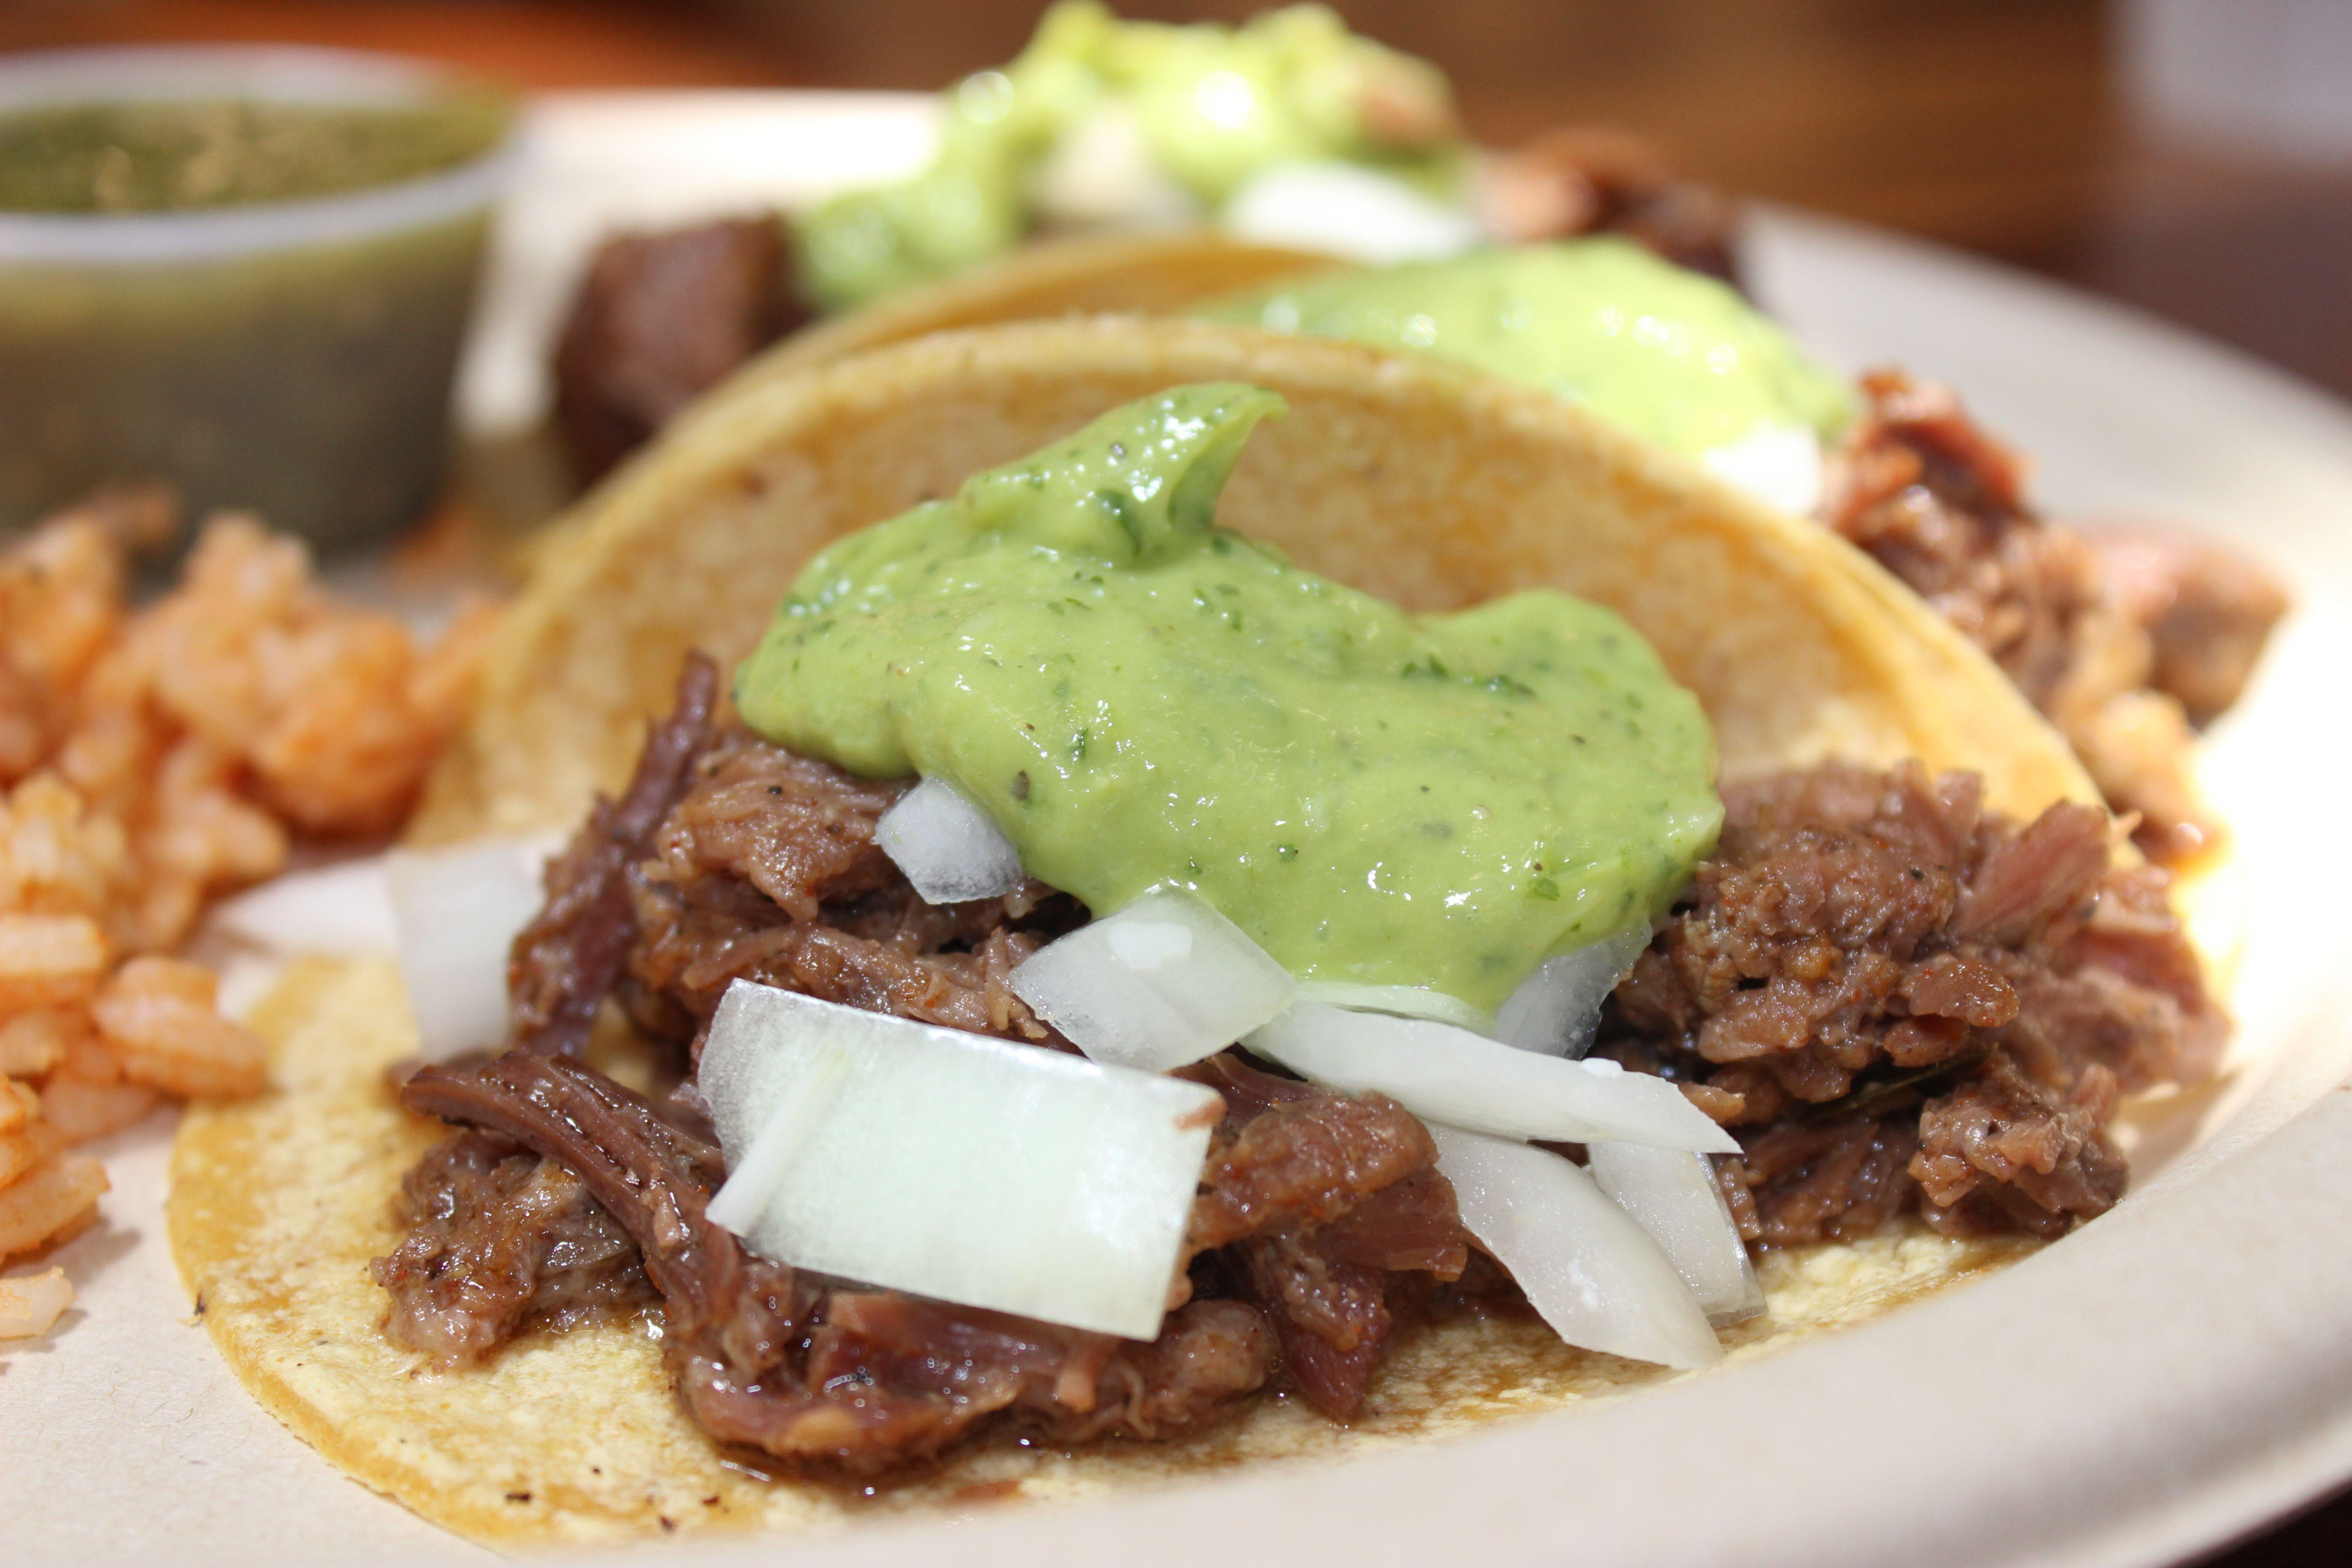 Taco Tuesday at Whole Foods Market